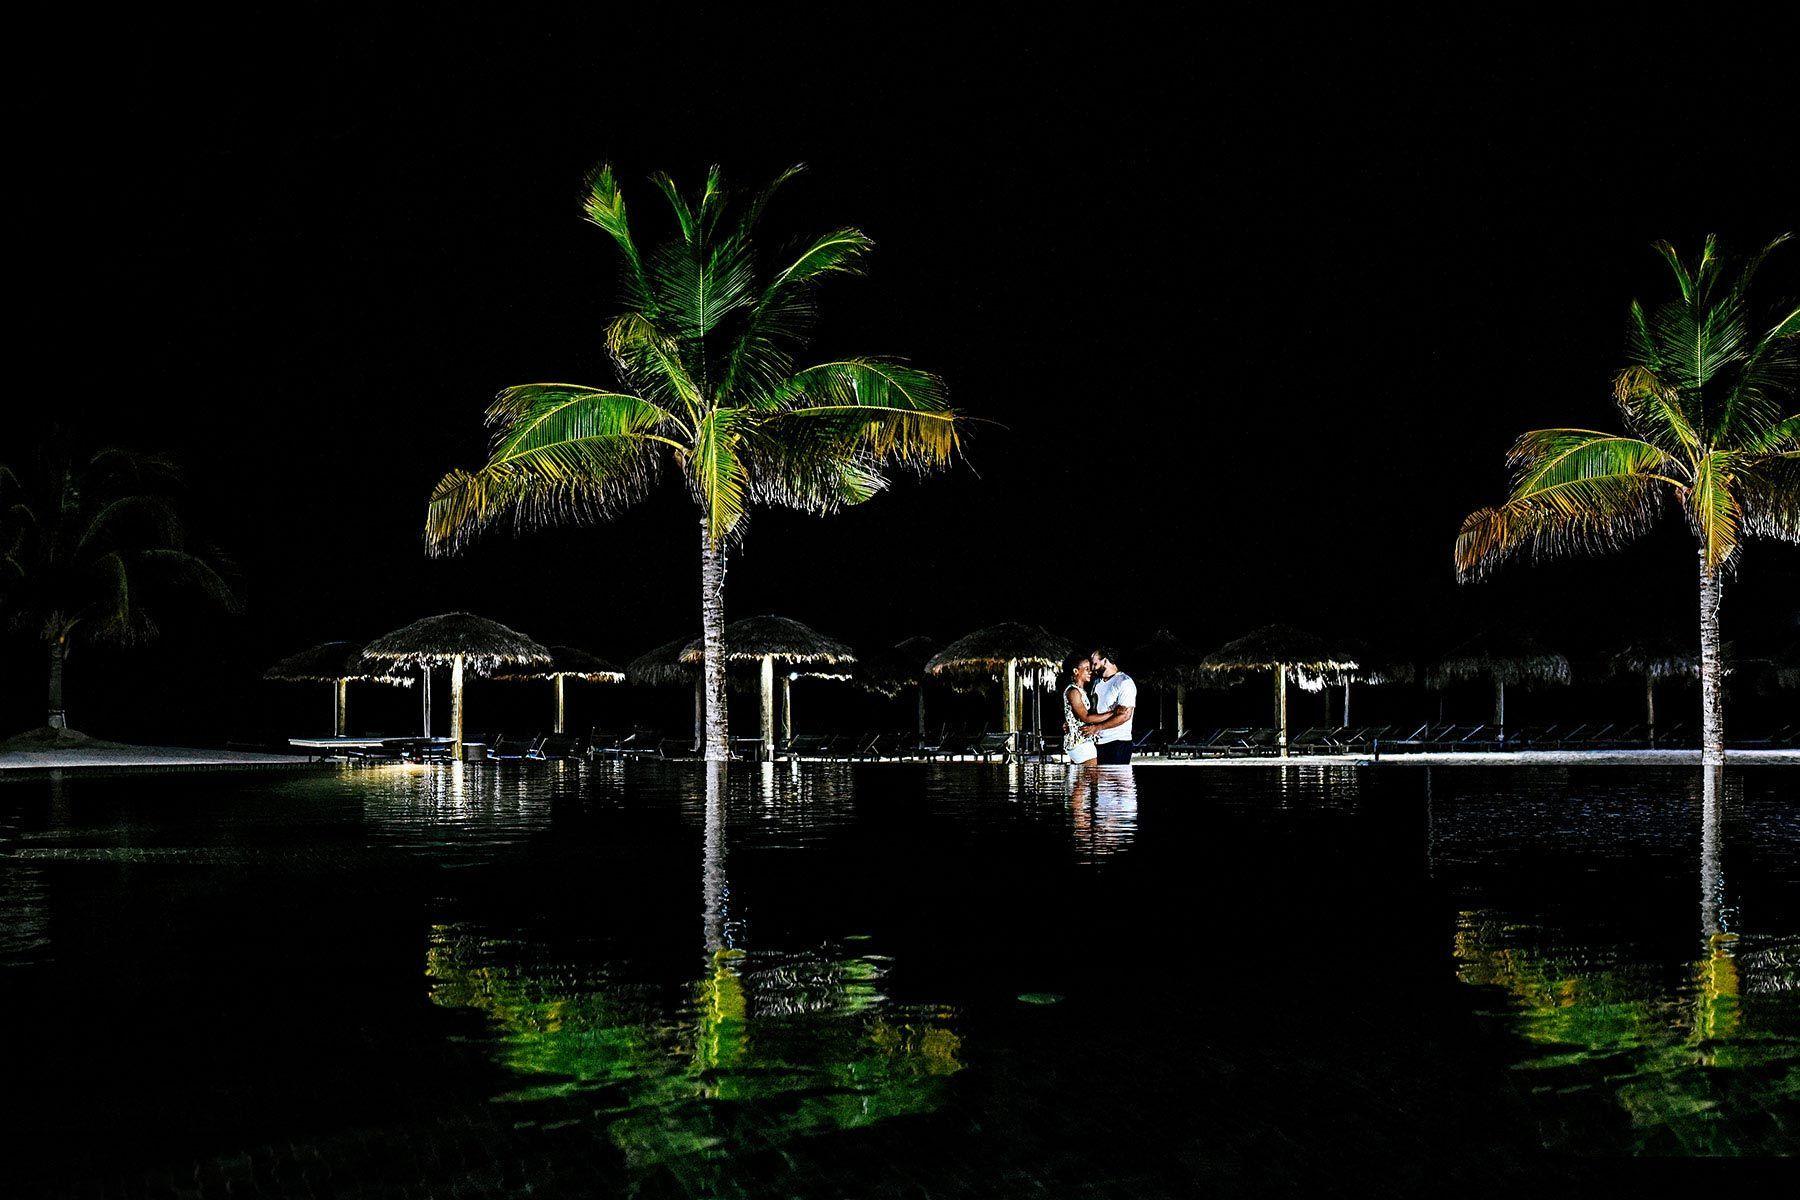 Casual photoshoot in Jamaica